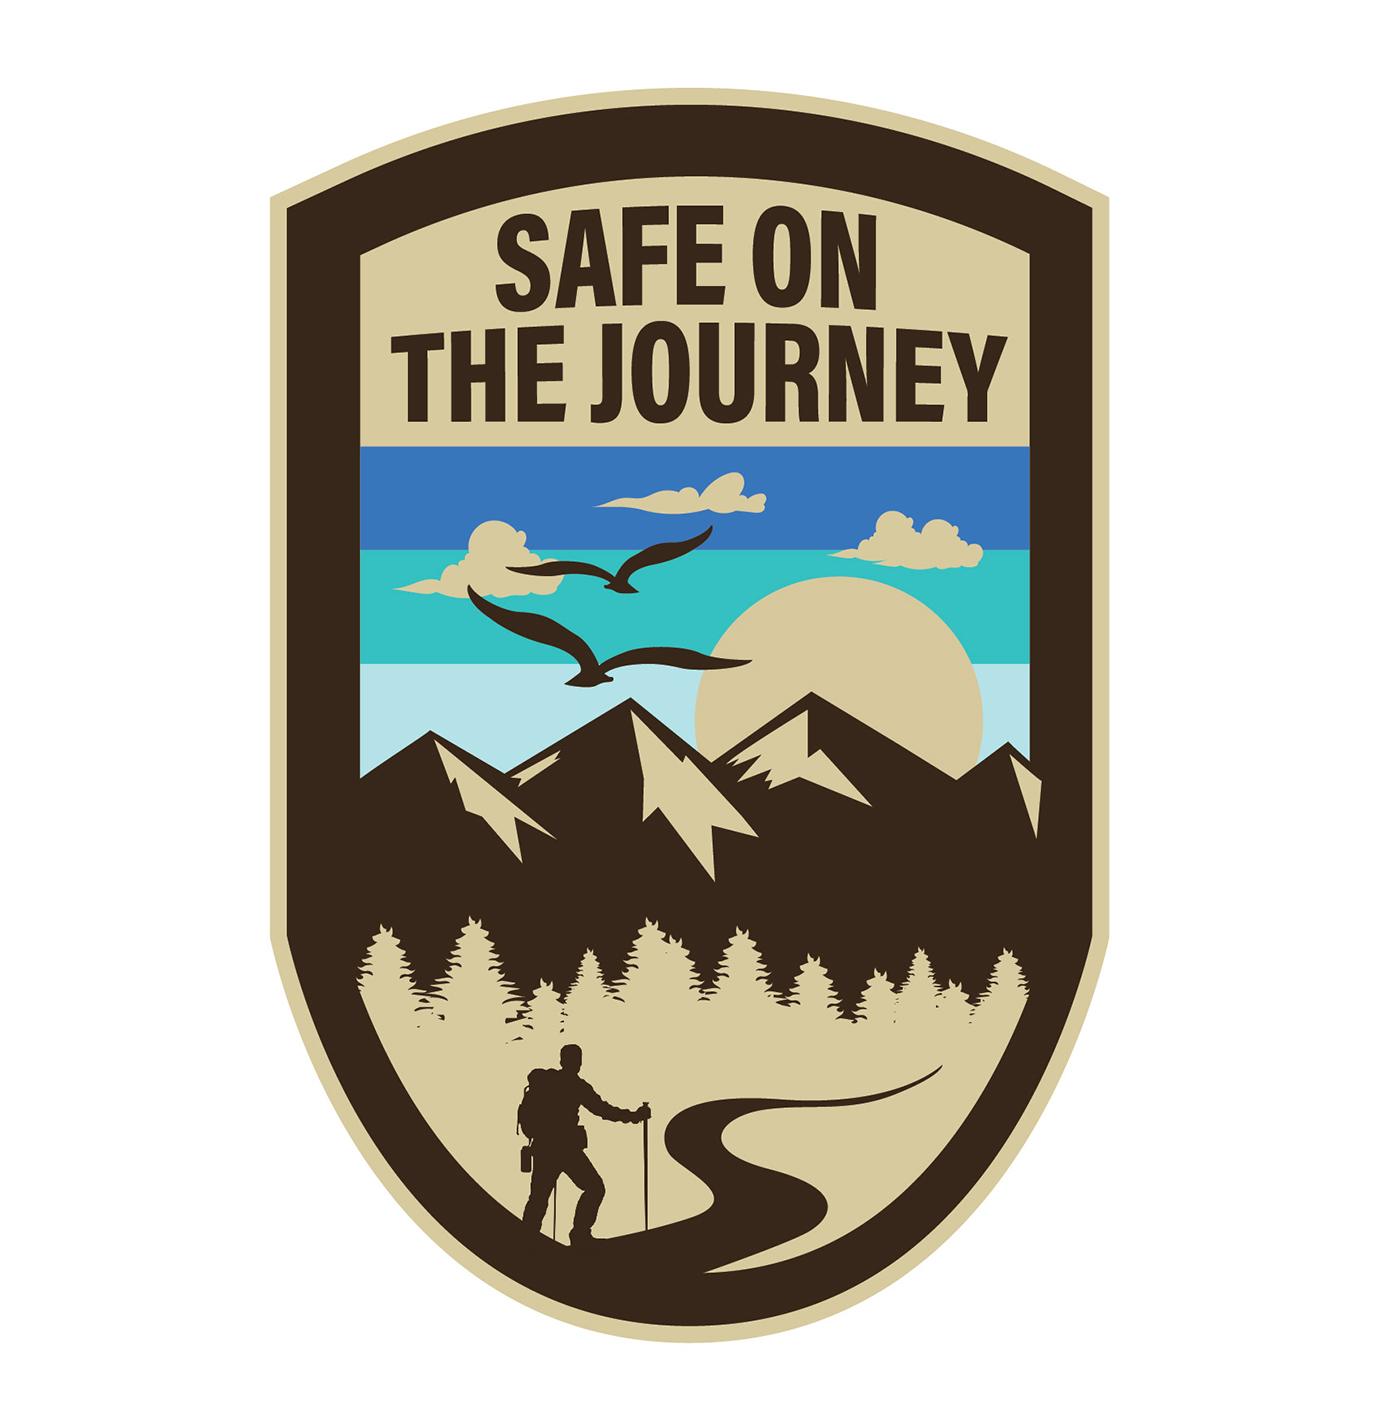 SafeontheJourney_Logo_v3-01 - 1x1 - v2.jpg